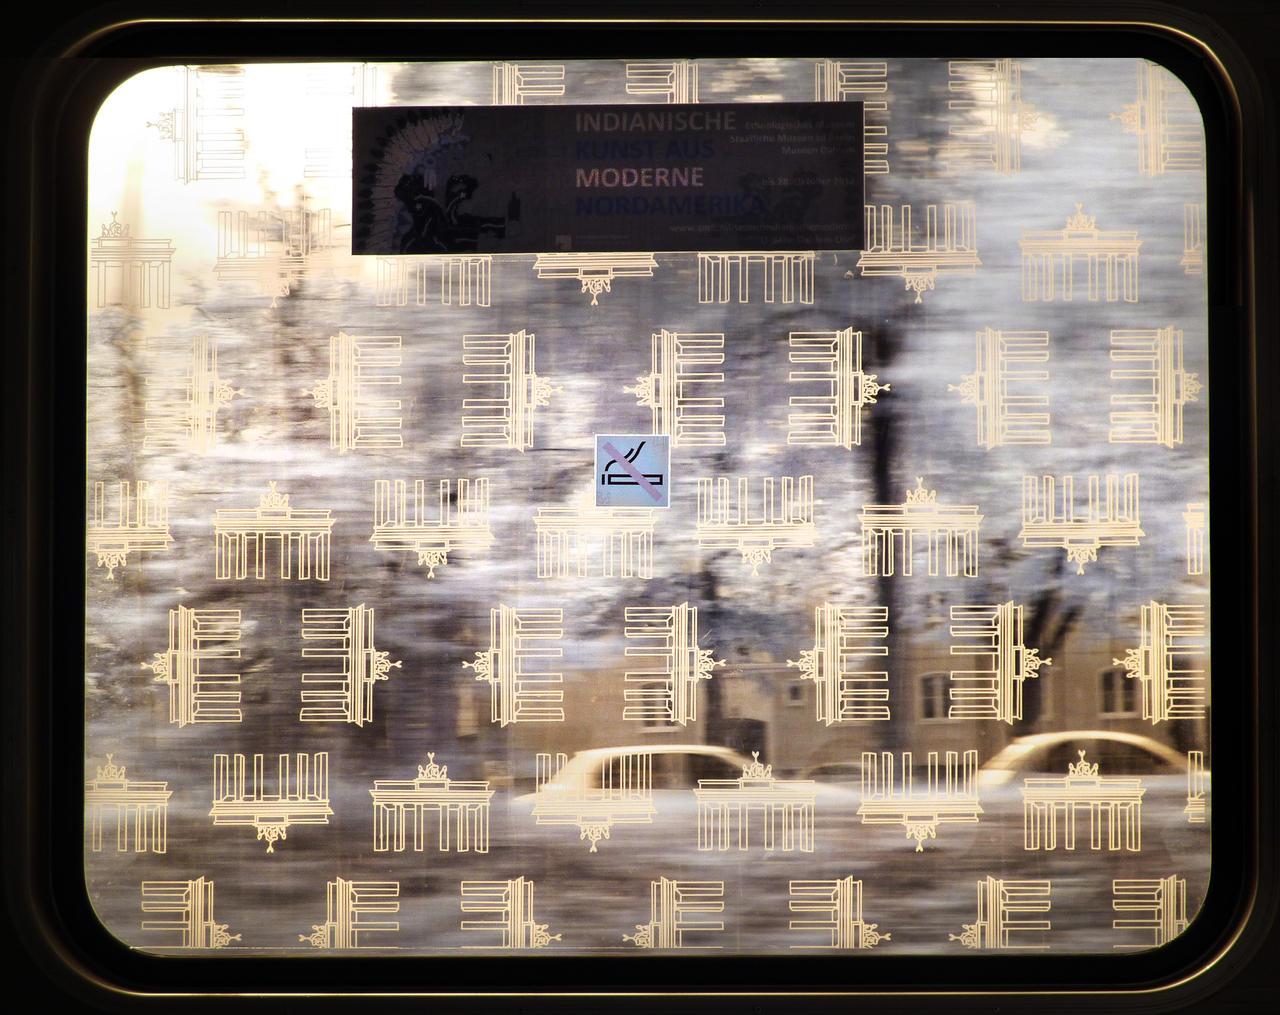 Berlin Underground Railway Window infrared by MichiLauke